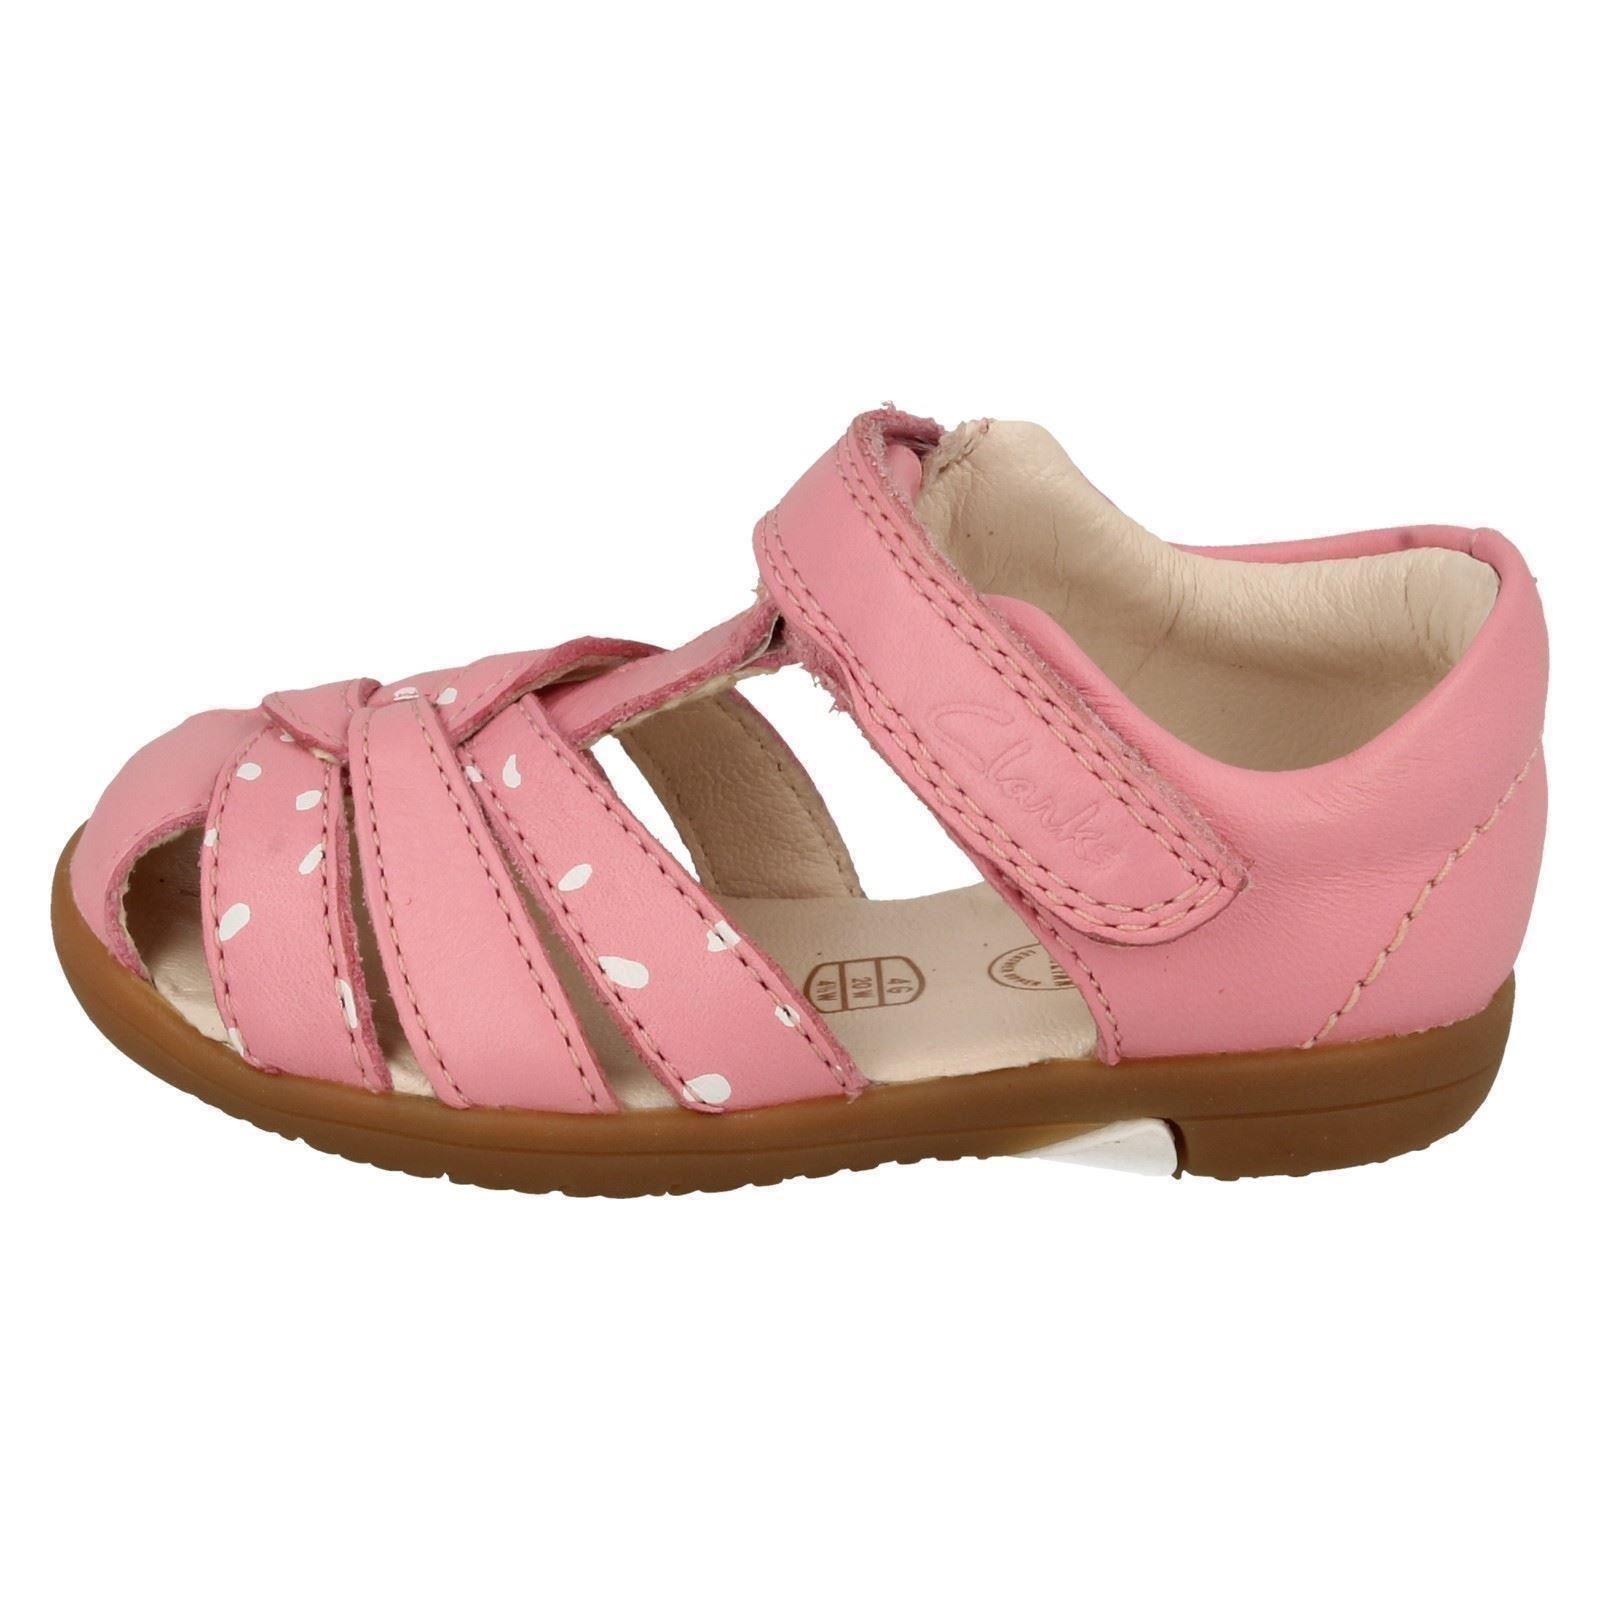 a06c4f51c2e Girls-Clarks-Closed-Toe-Sandals-Softly-Mae thumbnail 12